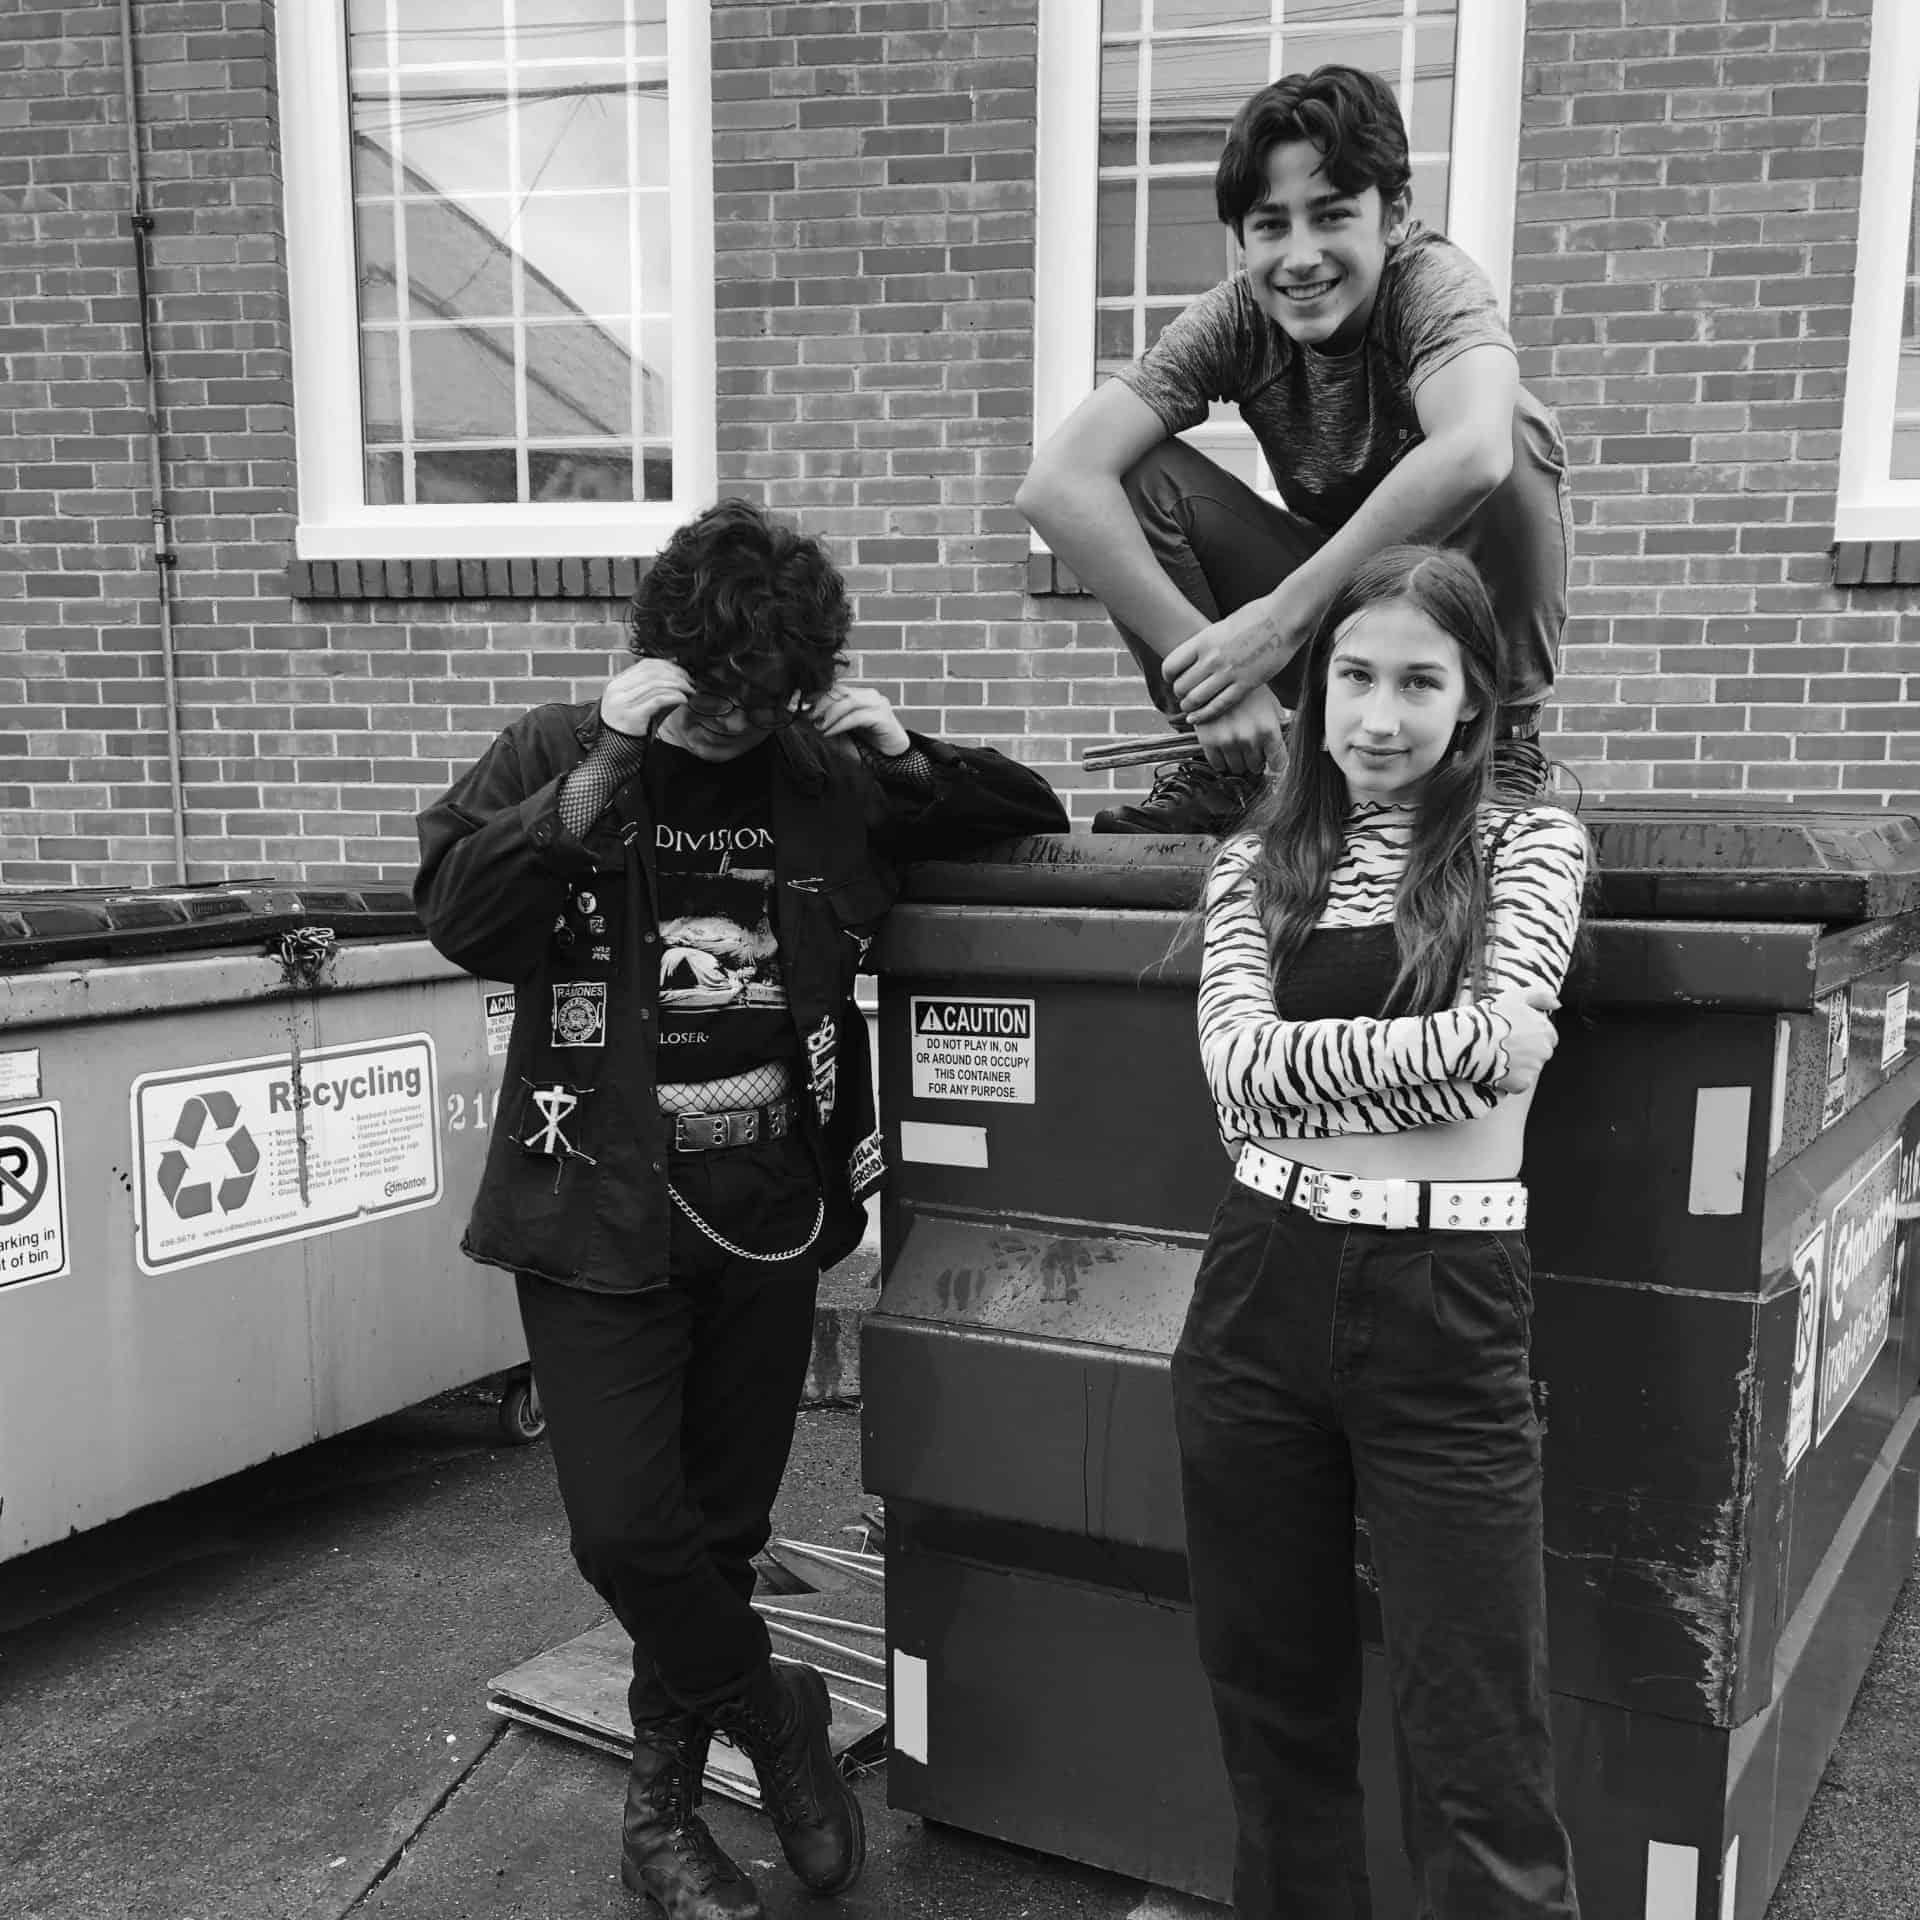 Rock Band Photo on Dumpster in Edmonton